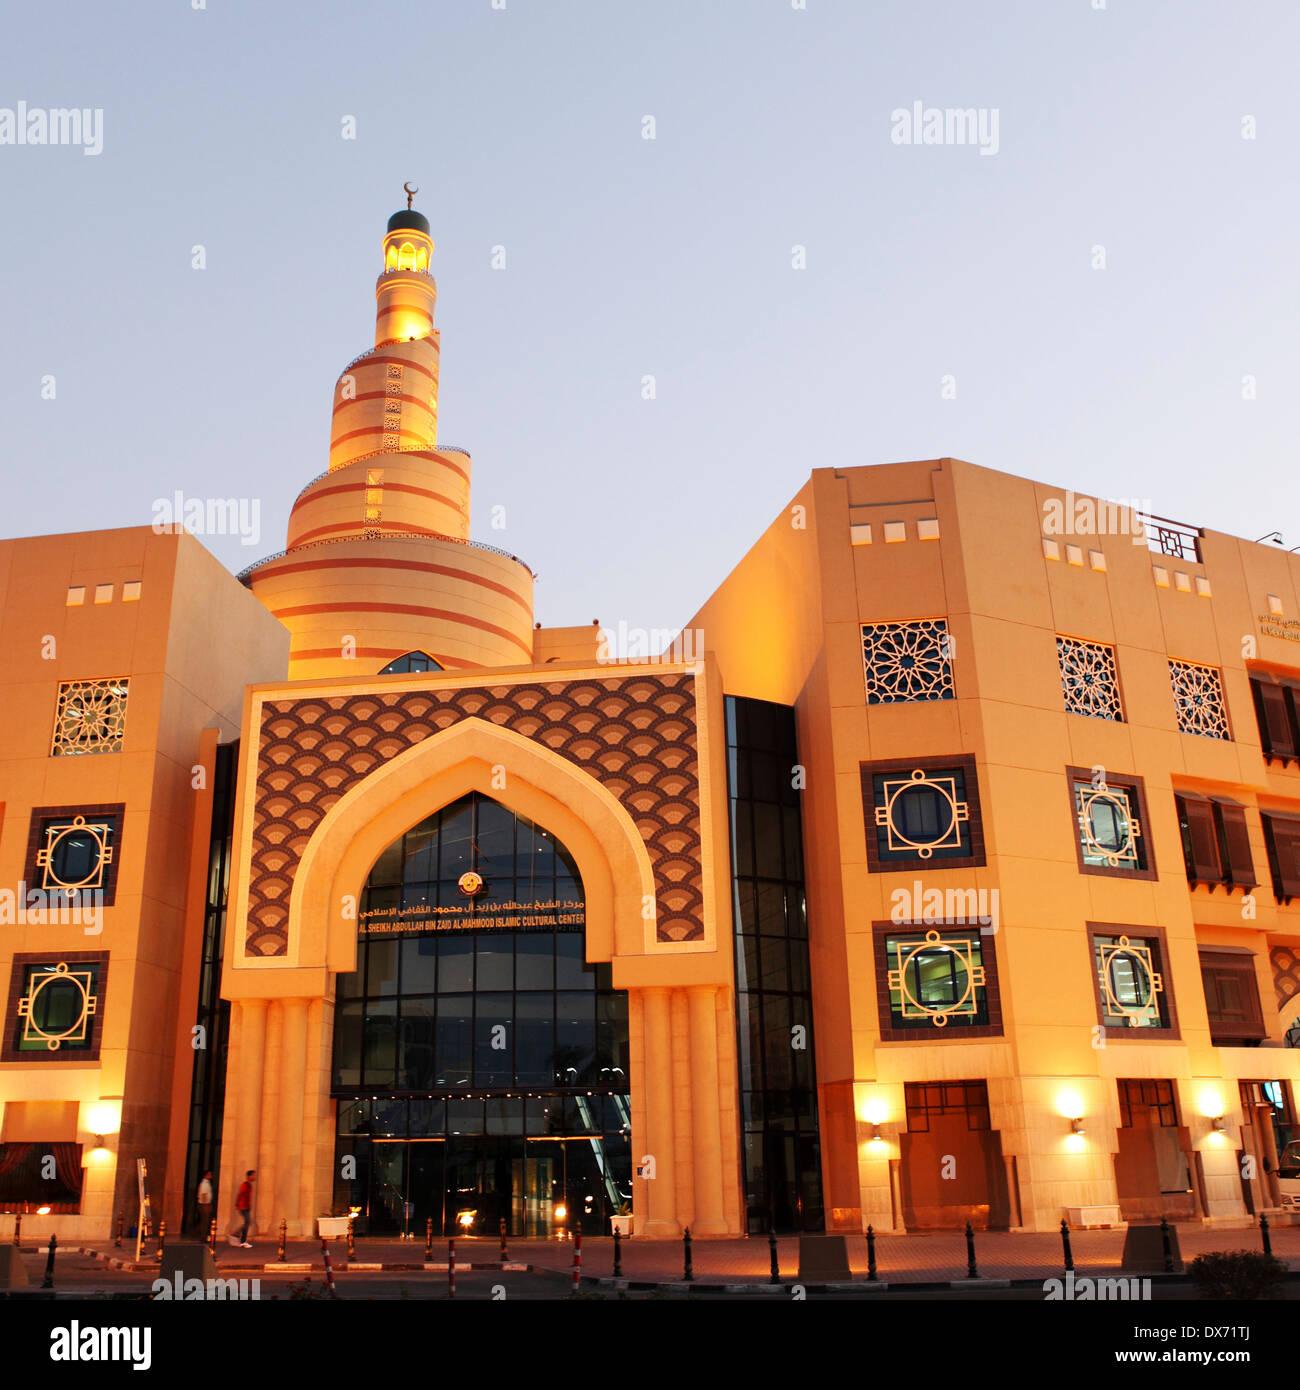 Le cheikh Abdullah bin Zaid Al-Mahmood Centre culturel islamique de Doha, au Qatar. Photo Stock